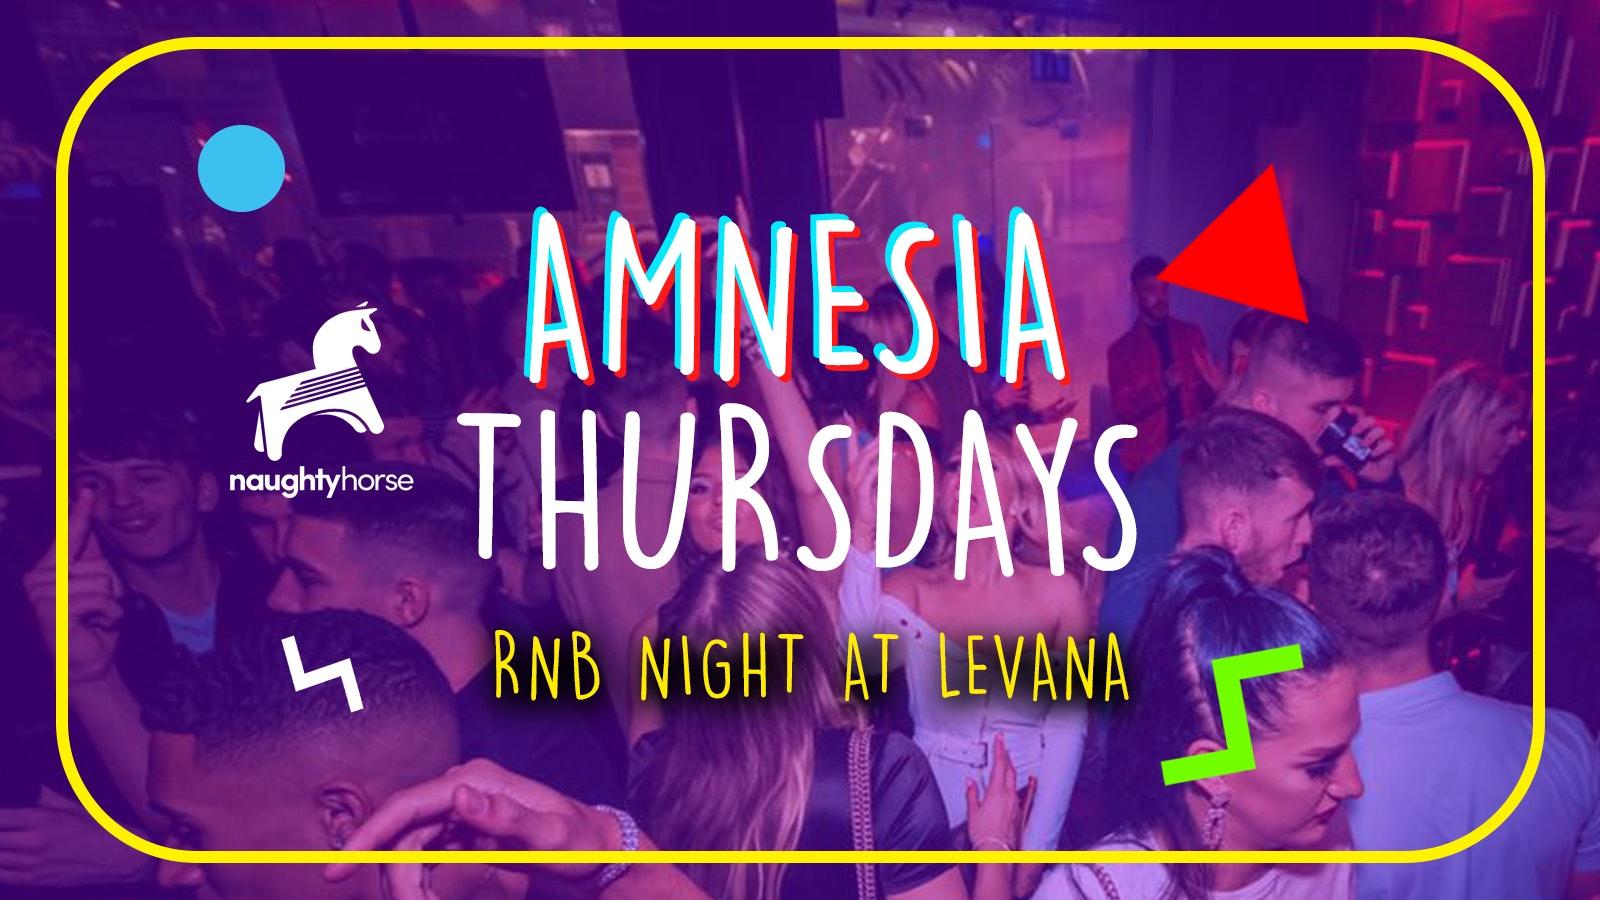 Amnesia Thursdays: HALLOWEEN SPECIAL – Levana [Naughty Horse]